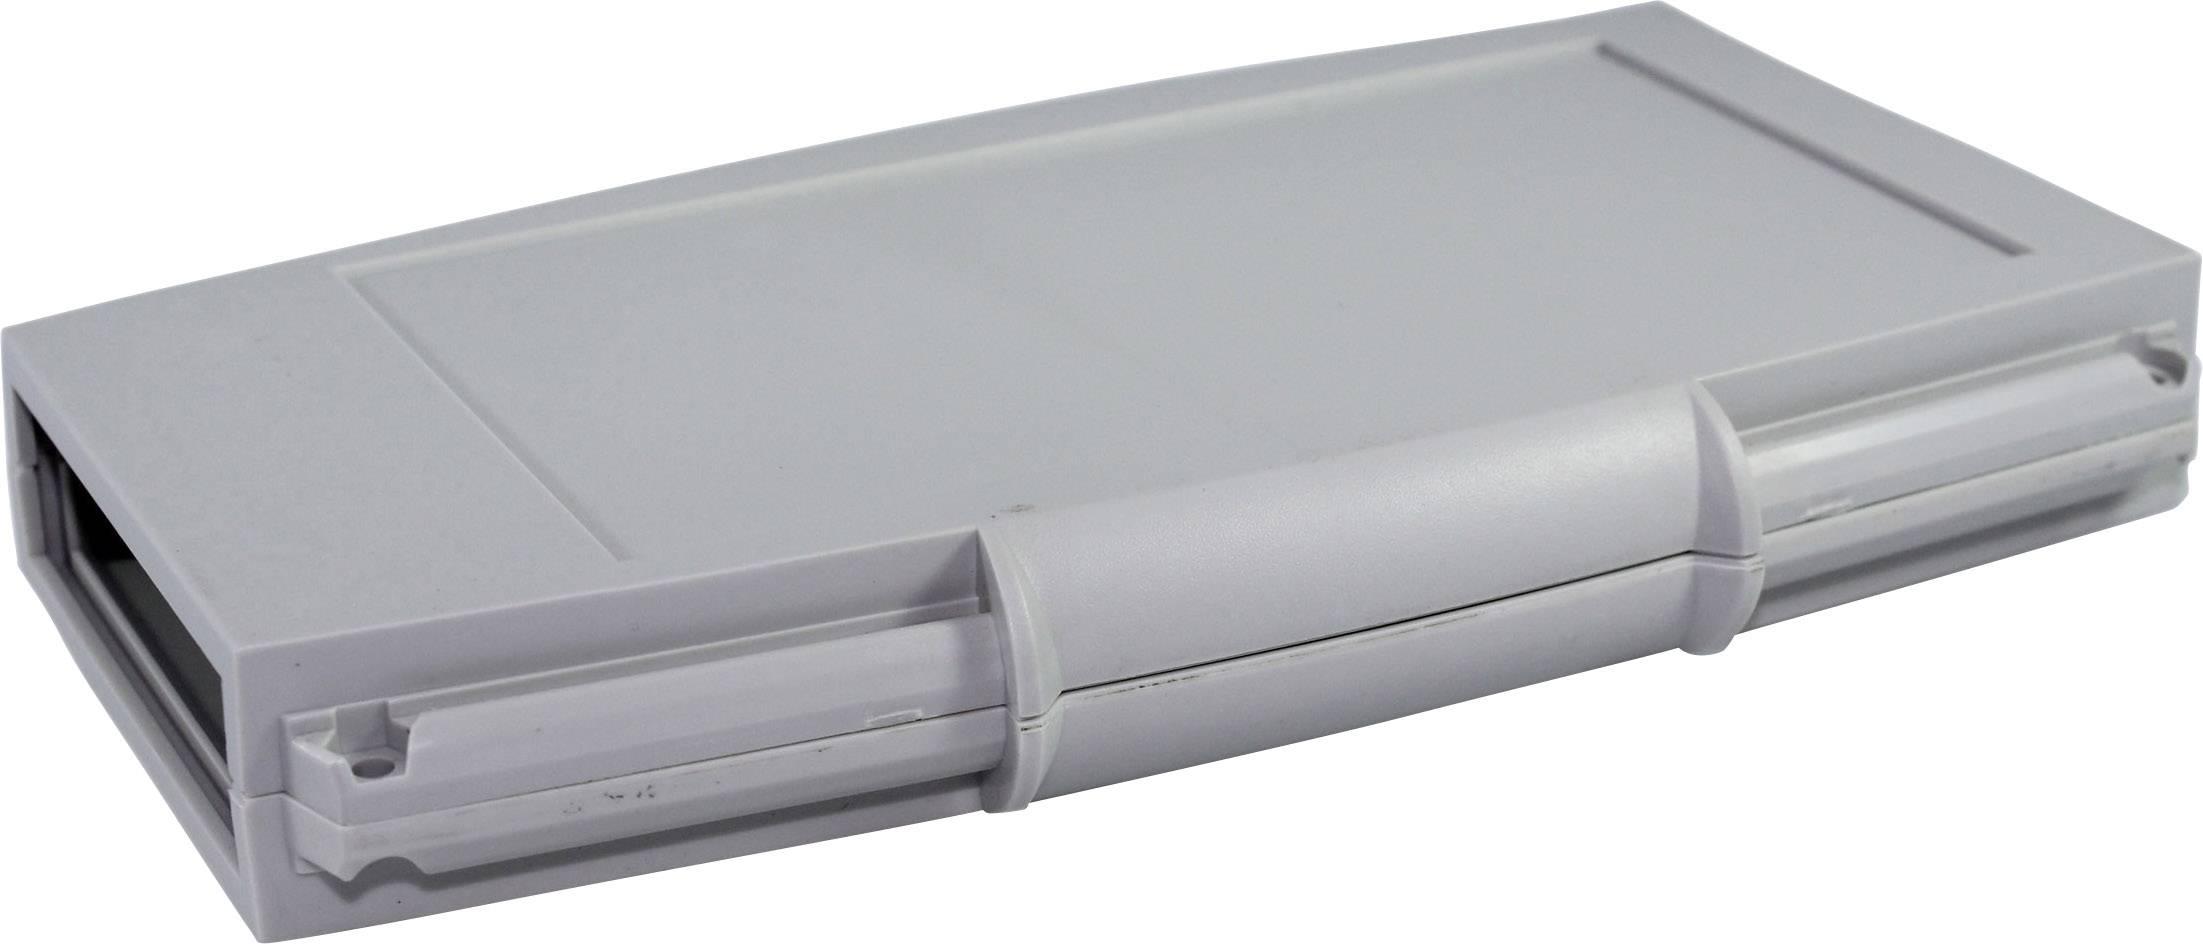 Plastová krabička Axxatronic CHH663NGY, 185 x 110 x 25 mm, ABS, světle šedá, 1 ks